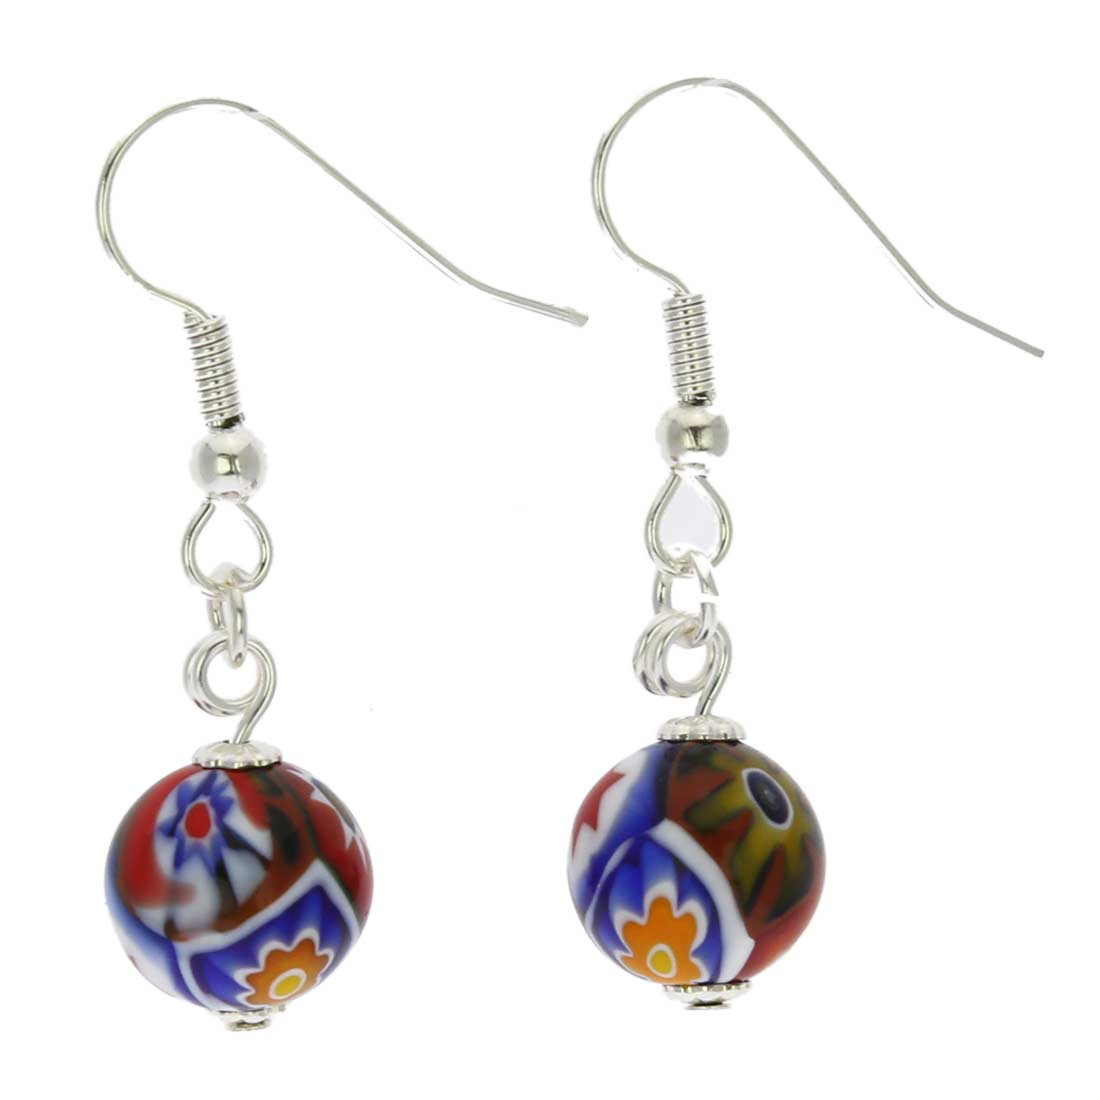 Murano Mosaic Millefiori Ball Earrings - Silver